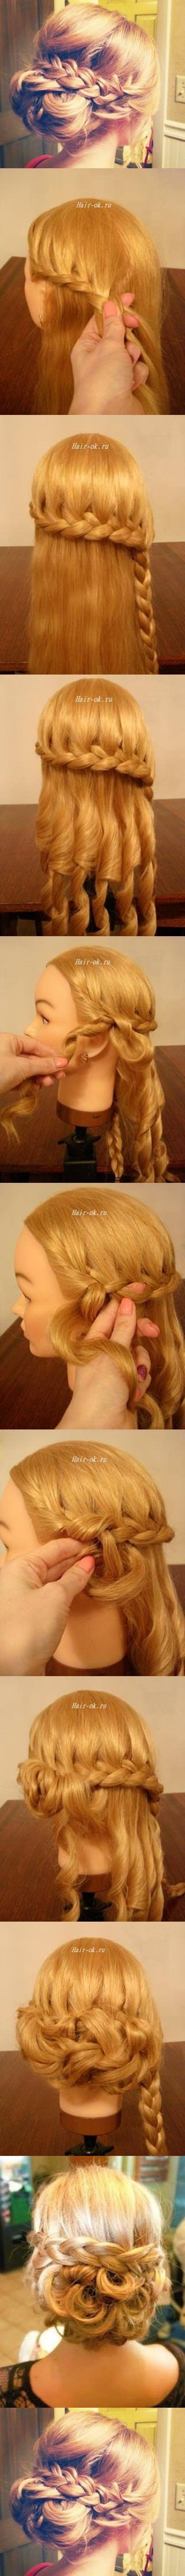 braided bun hairstyle m Wonderful DIY braided bun hairstyle